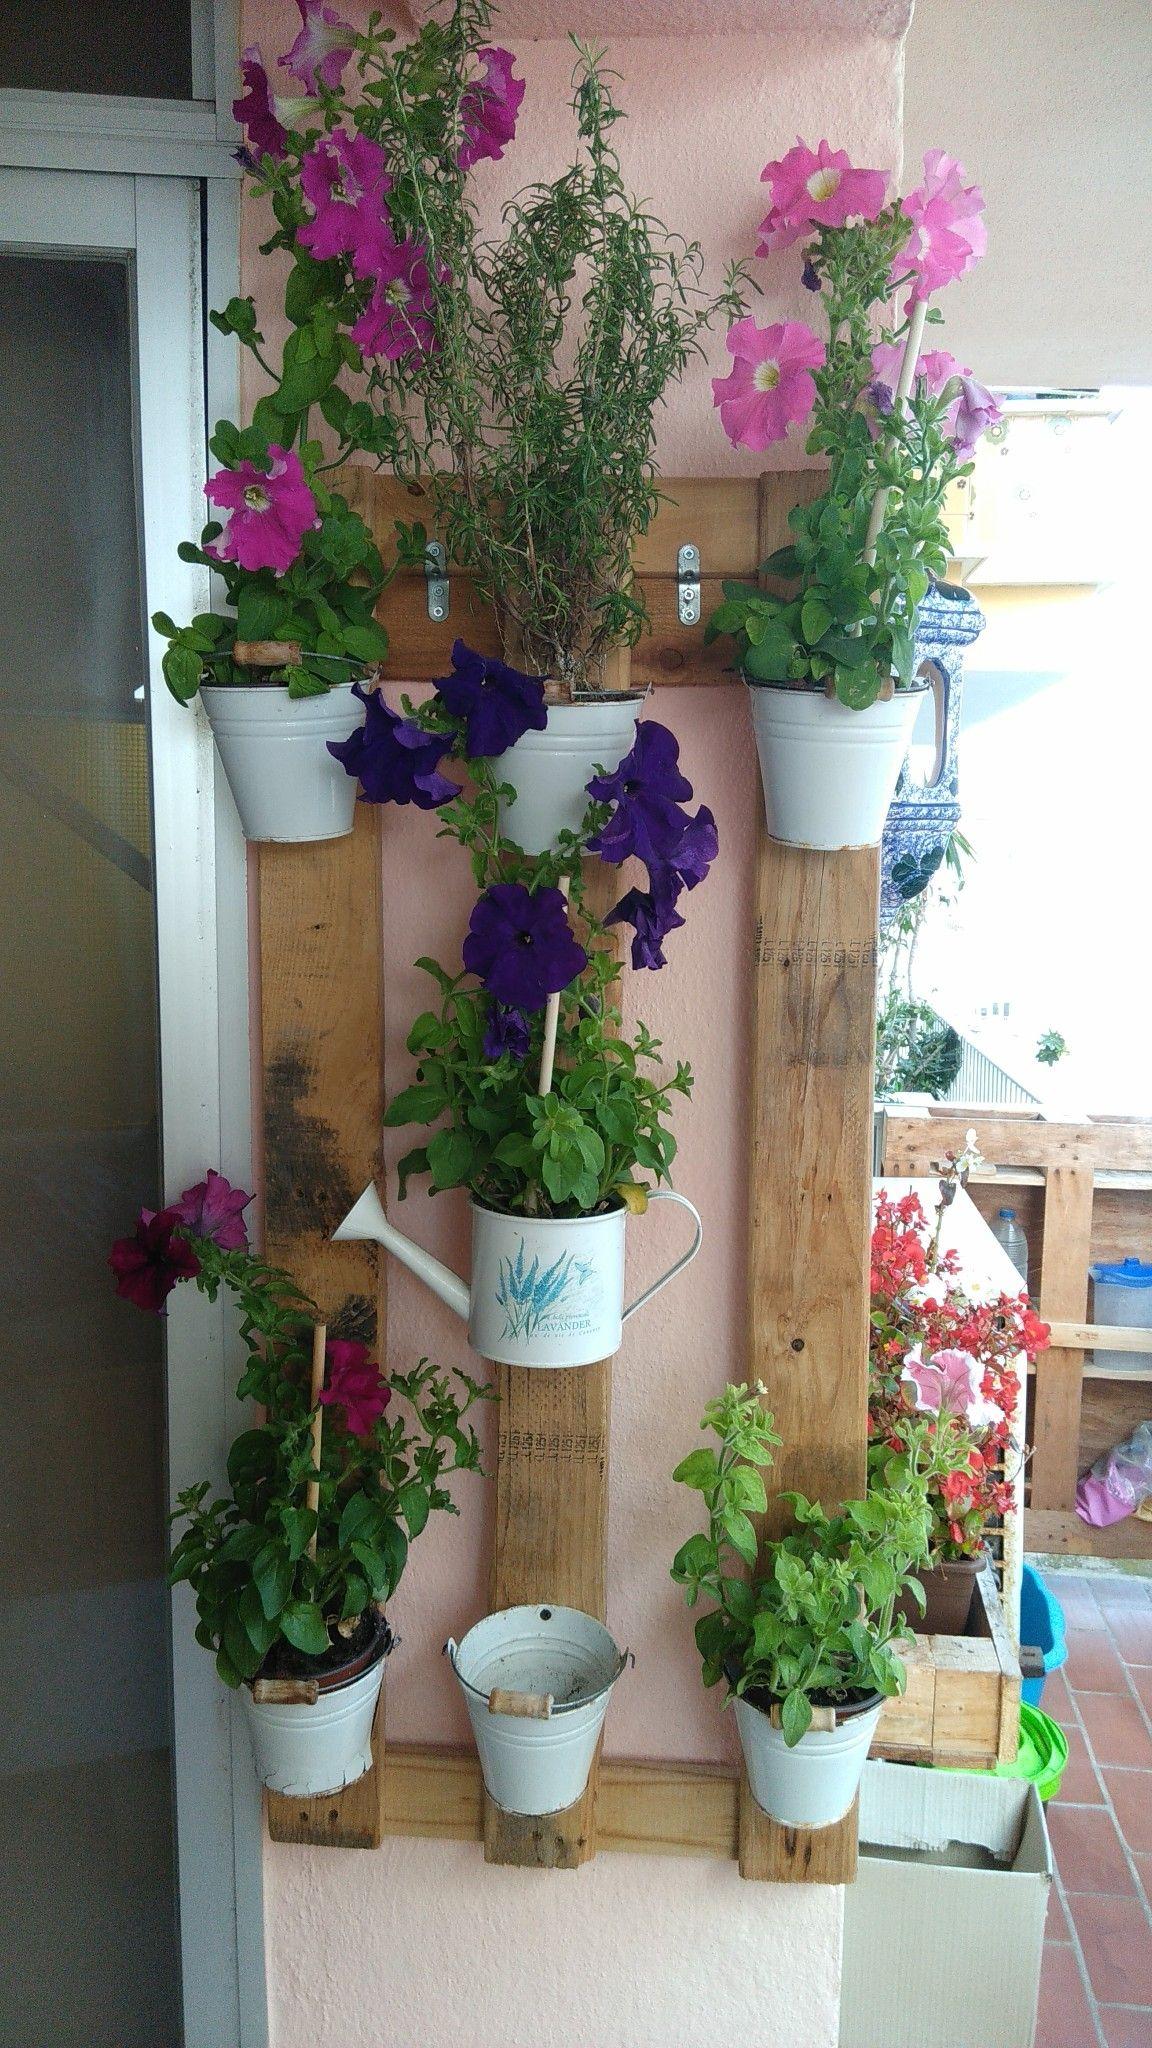 Jardinera Colgante Fabricacion Propia Con Palets Pinterest - Jardinera-colgante